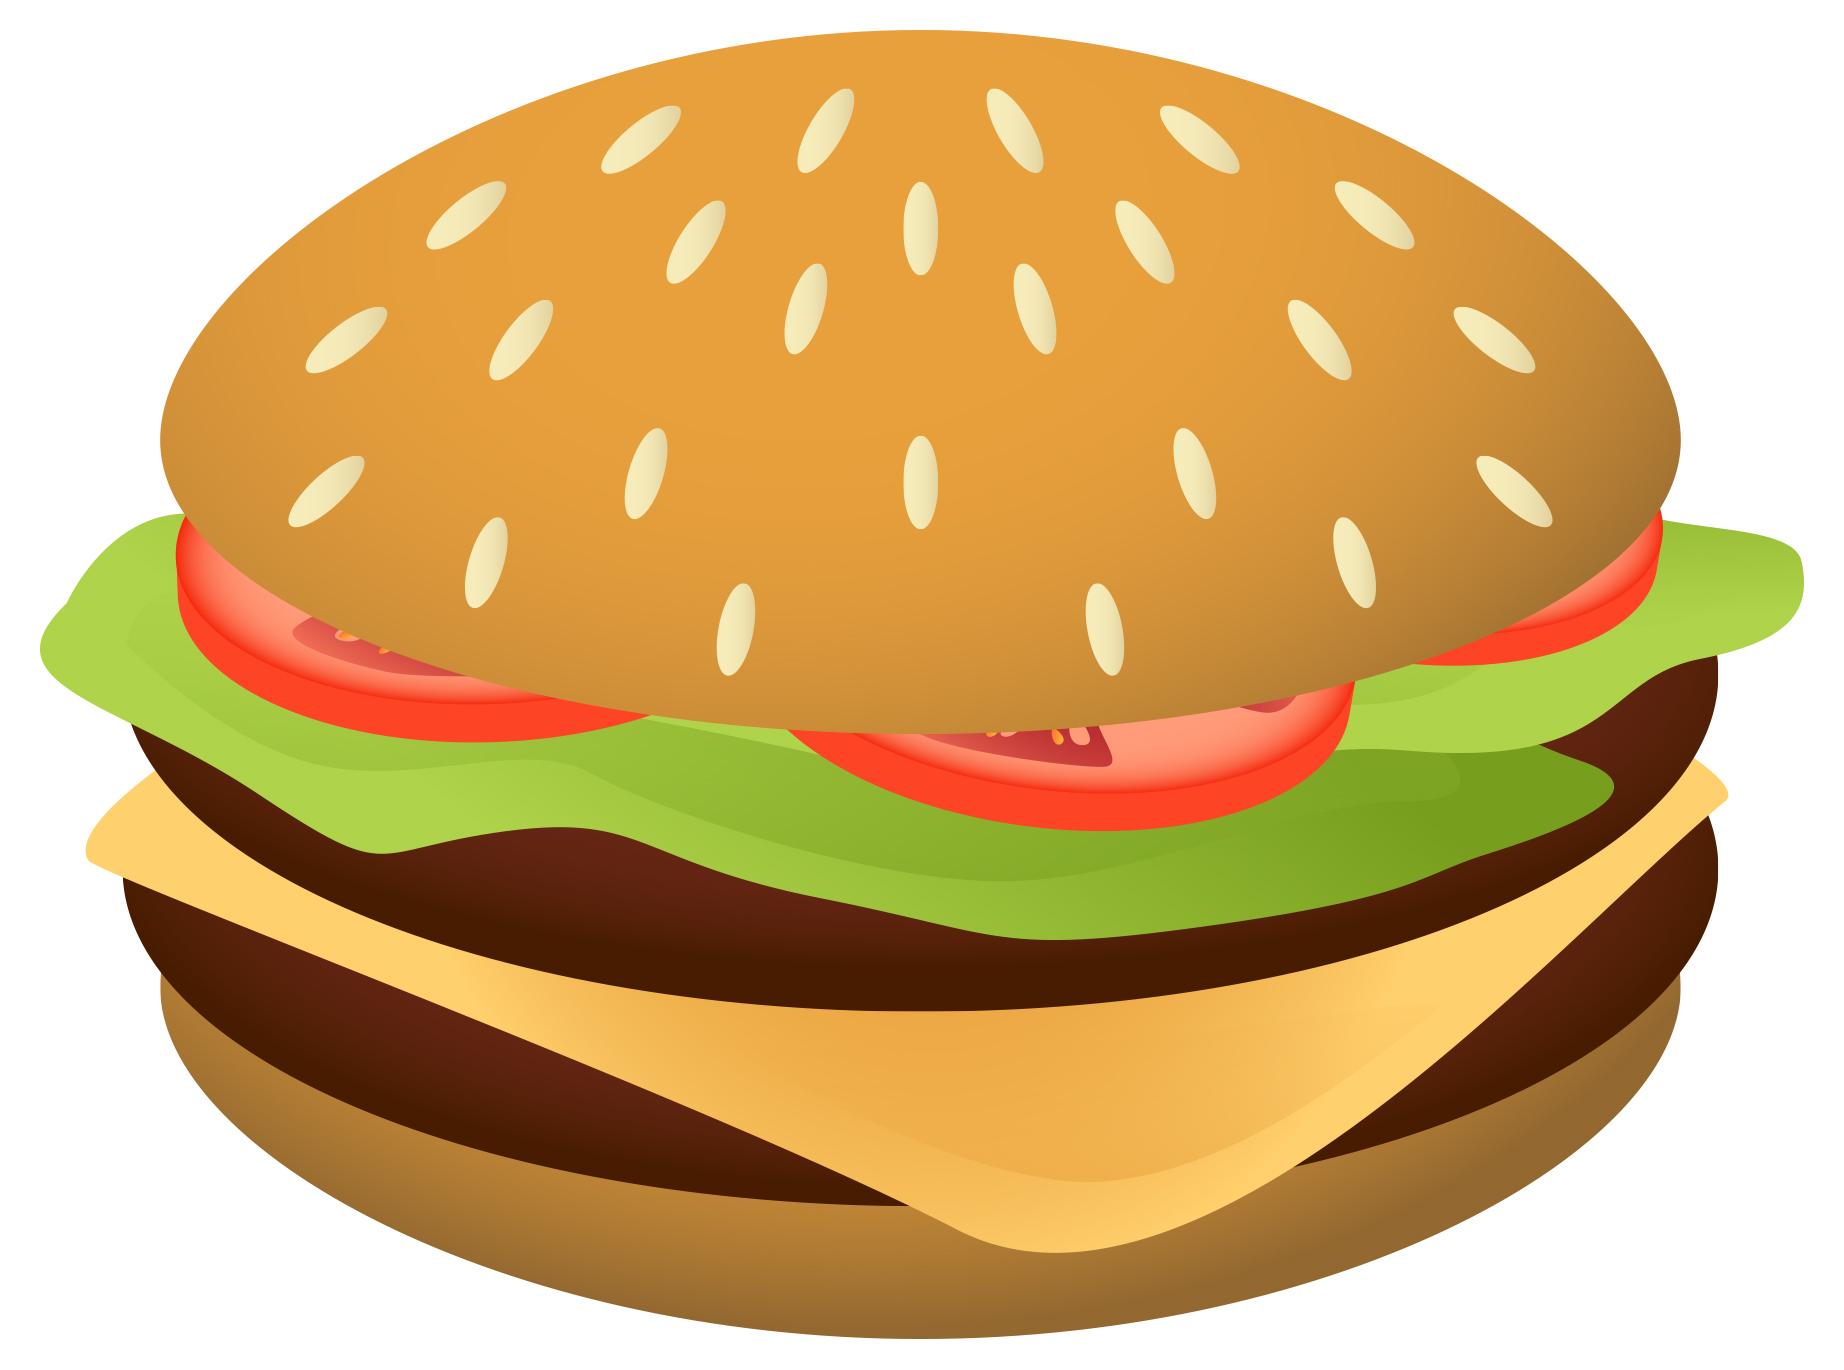 Burger clipart logo. Image clip art library